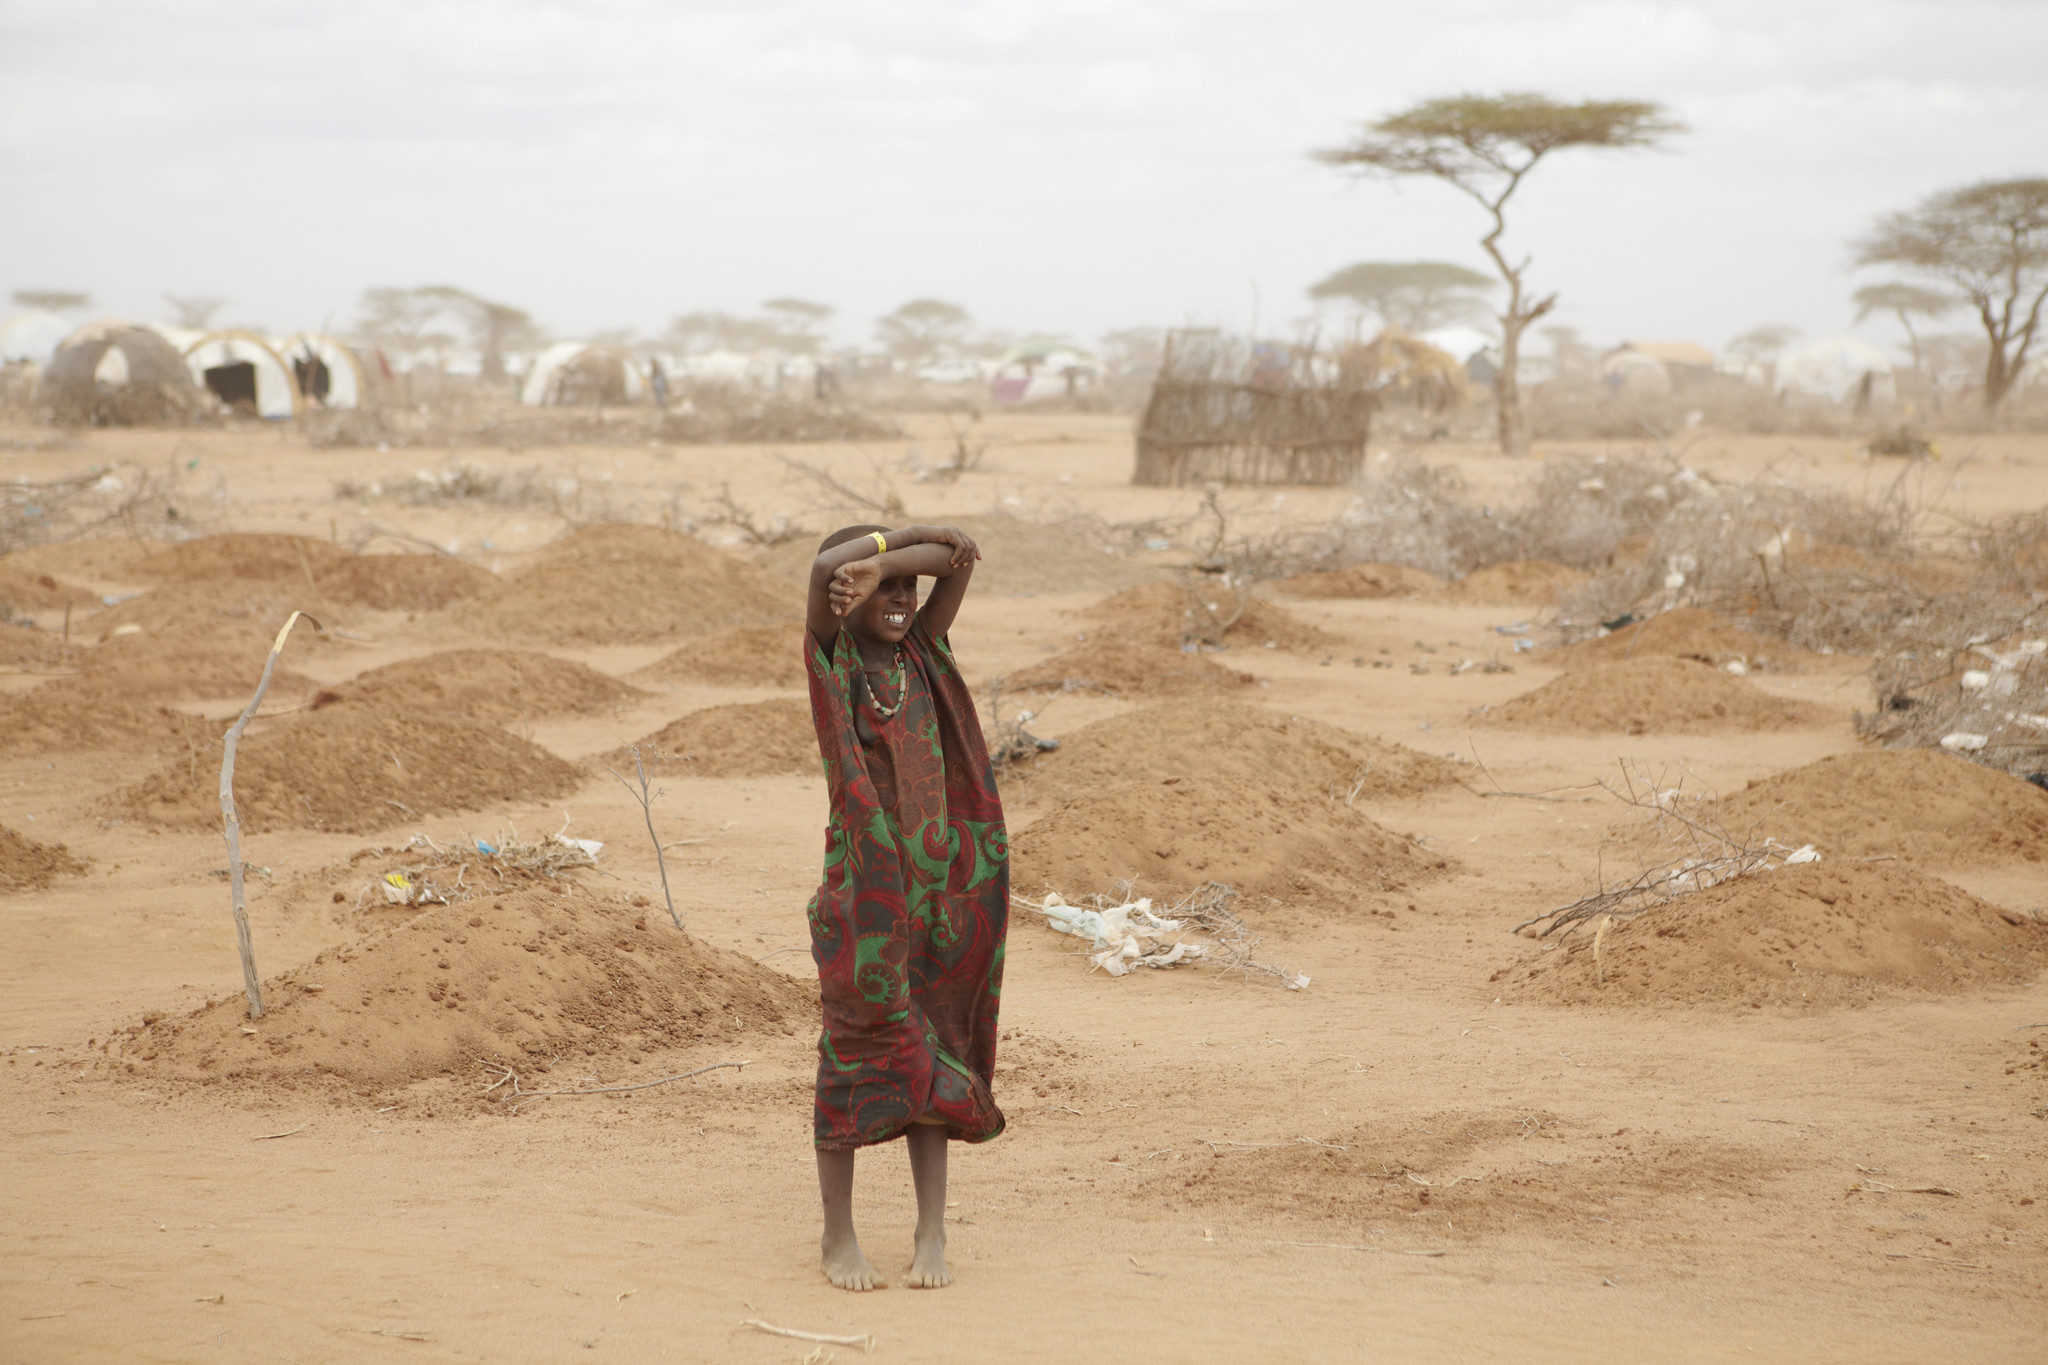 FAO: Somalia facing large- scale food insecurity